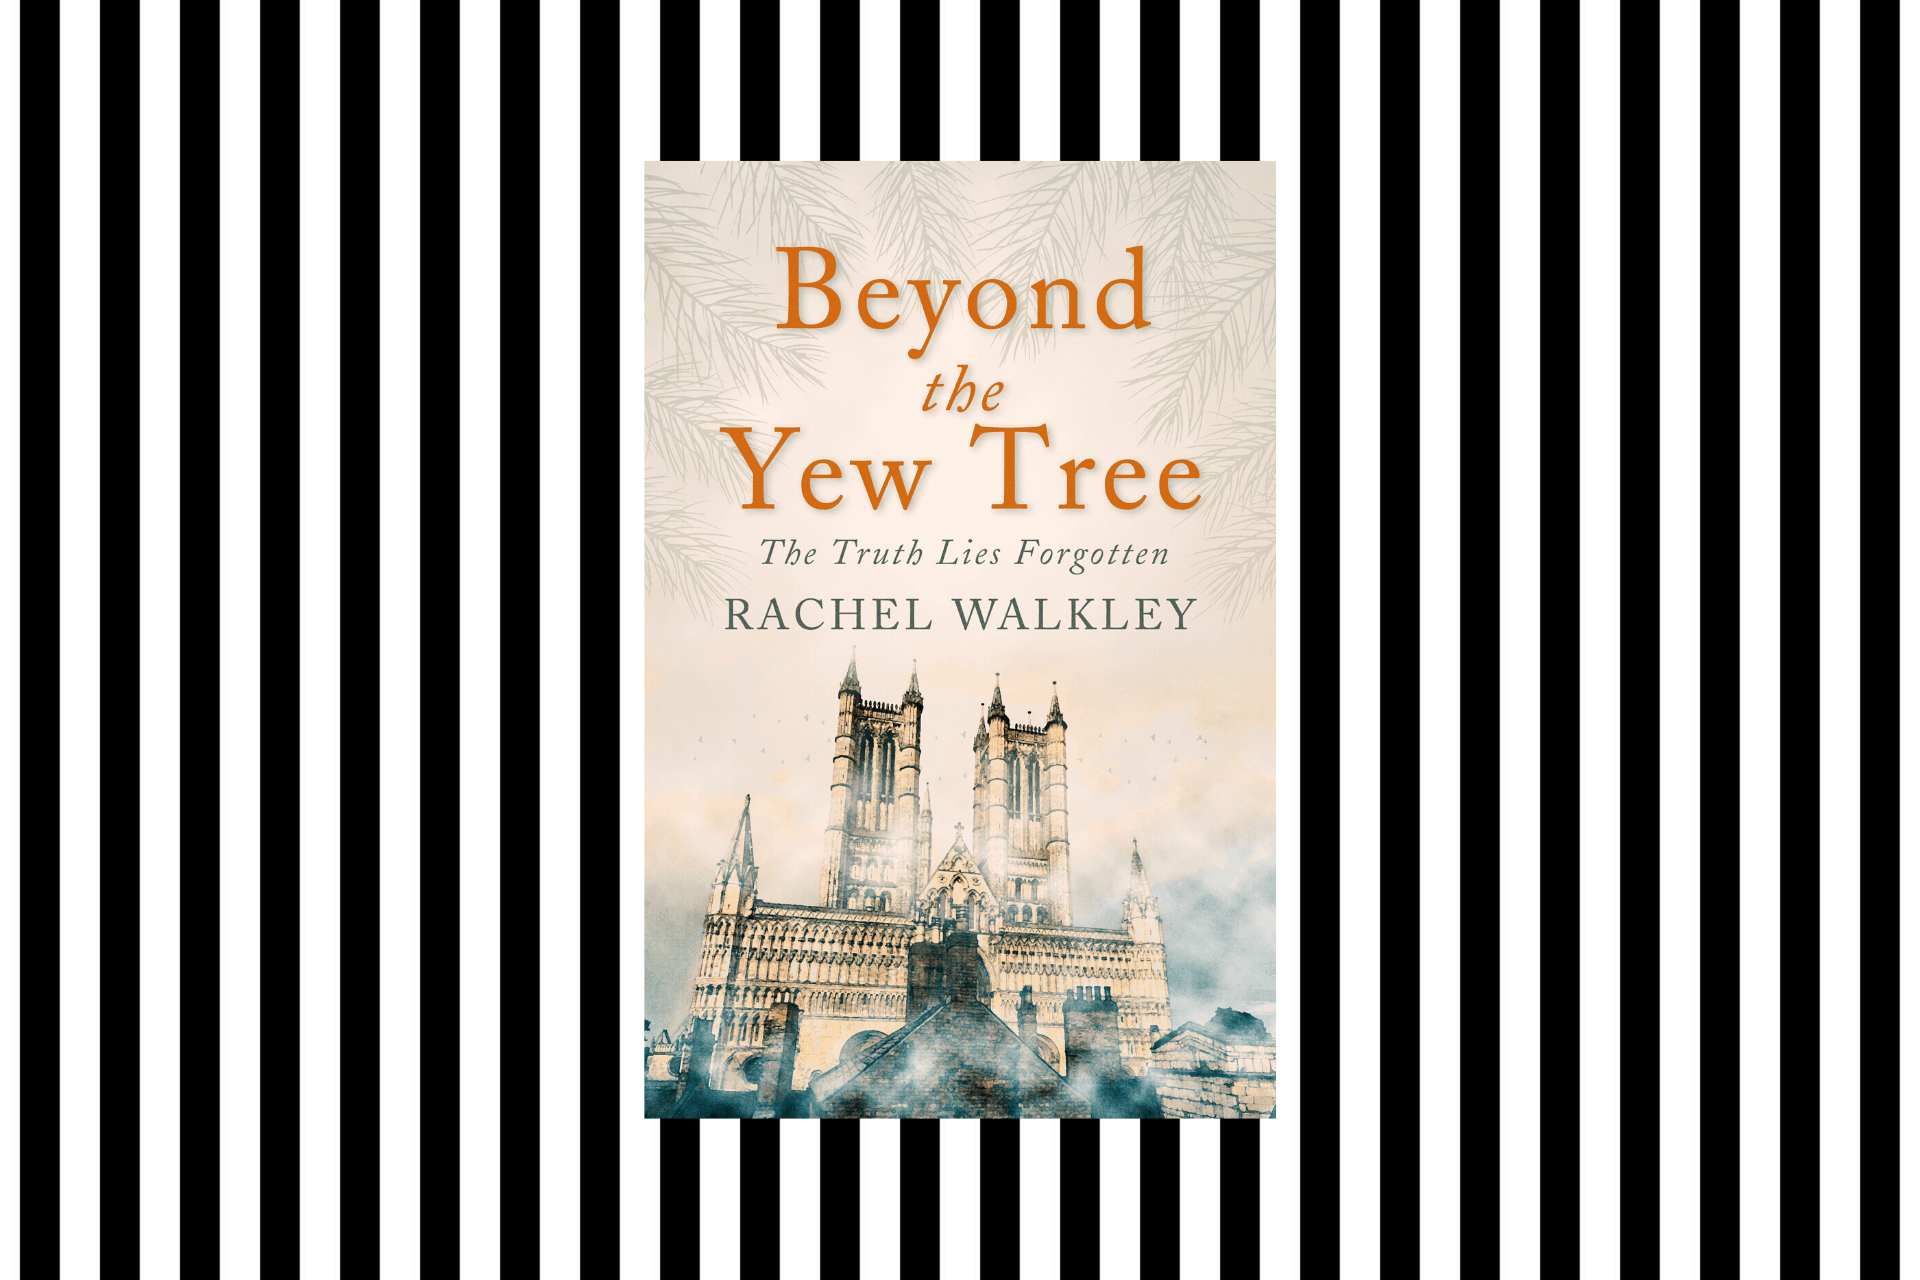 Beyond the Yew Tree by Rachel Walkley